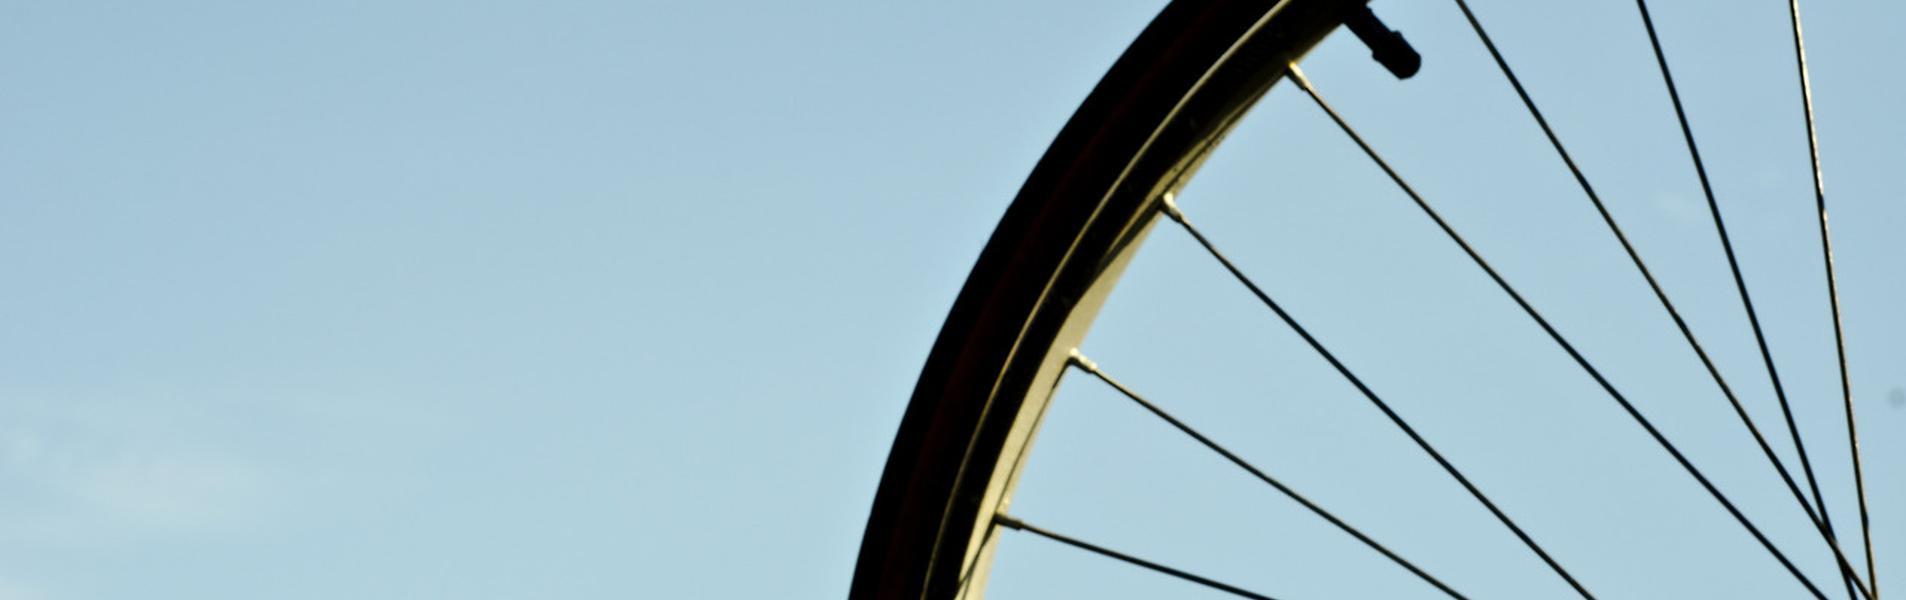 Museo de la Bicicleta en Miniatura